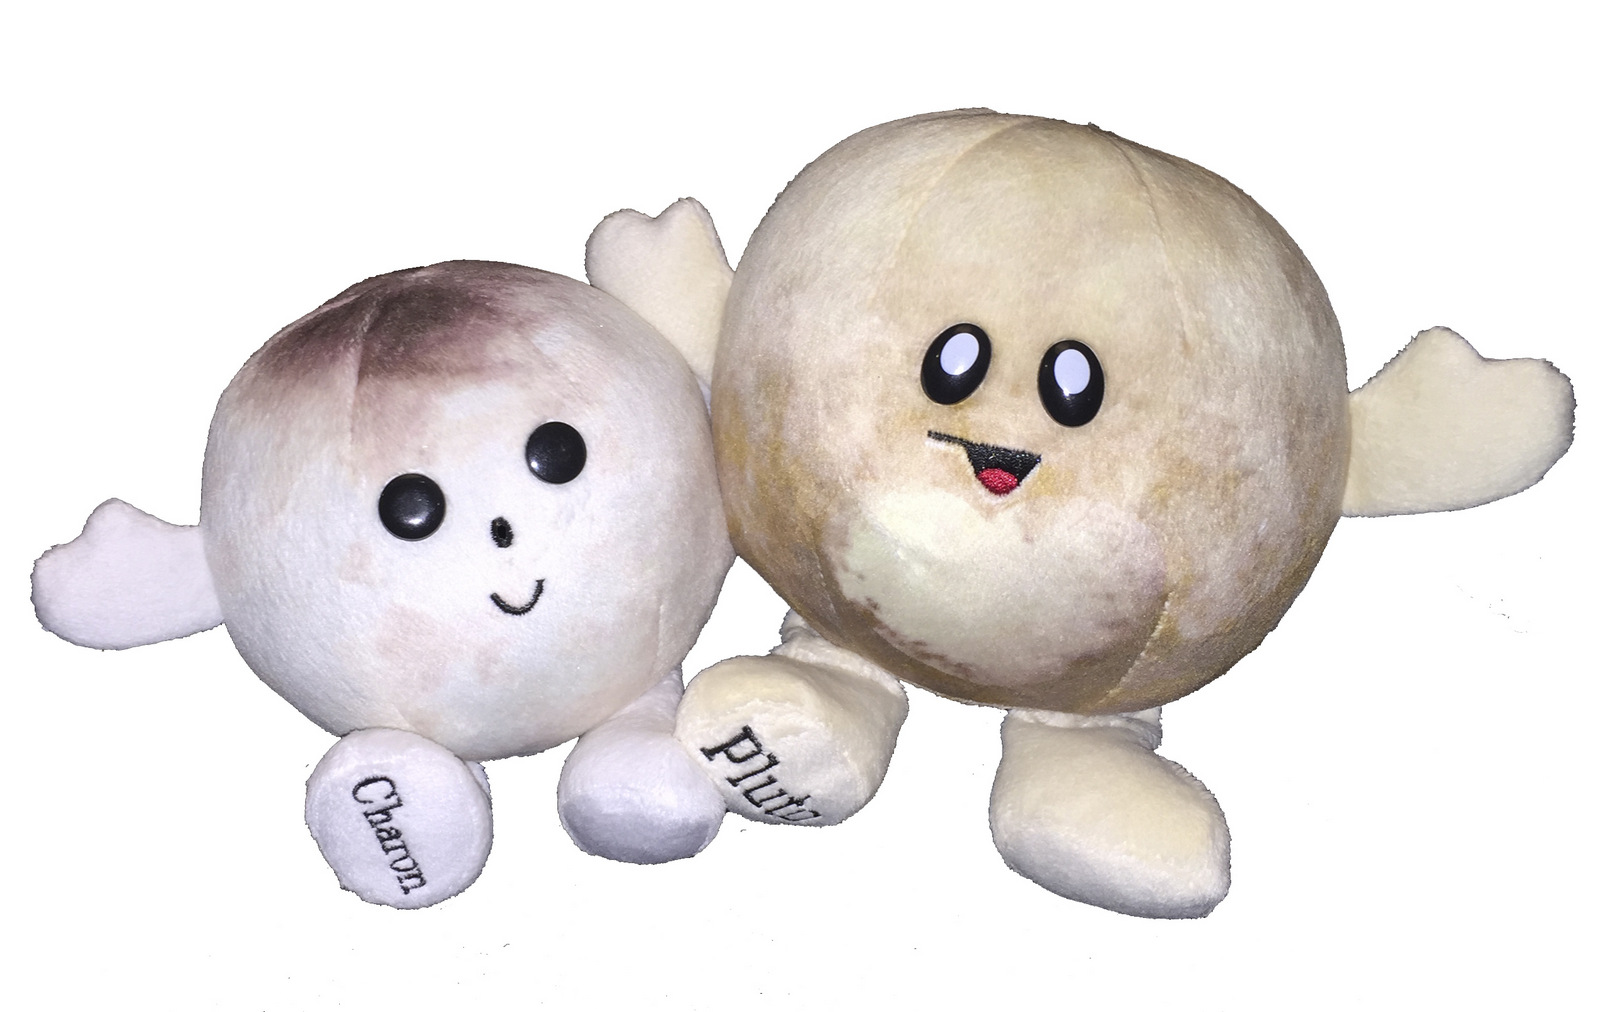 Plush Pluto Buddy (w/ Charon),748252135193